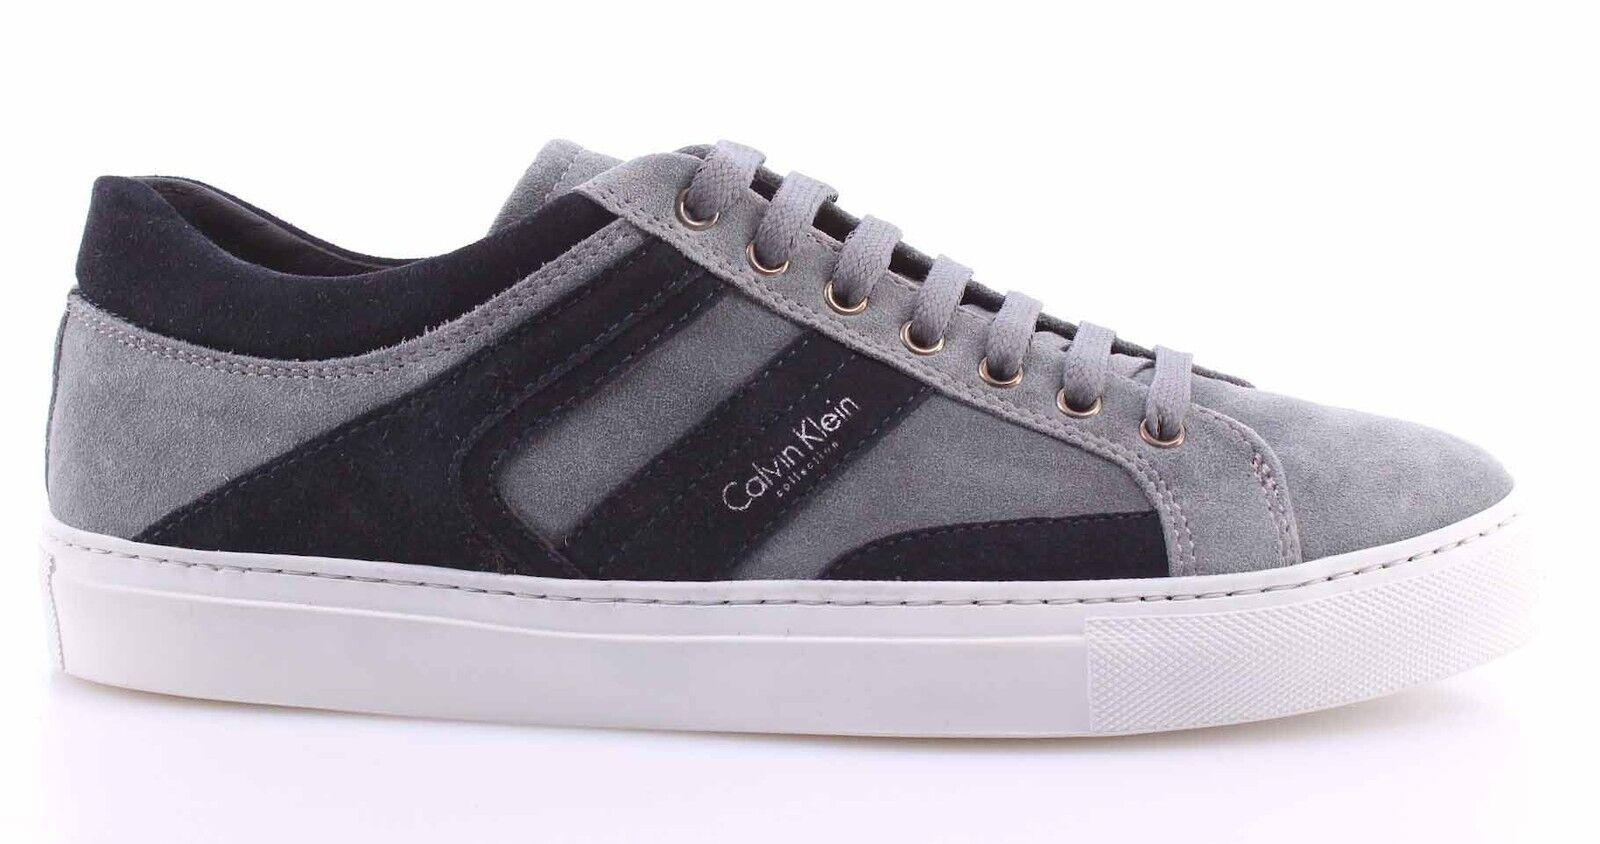 Herren Schuhe Sneakers Wildleder CALVIN KLEIN Collection Underground Wildleder Sneakers Grau Blau b2c30b